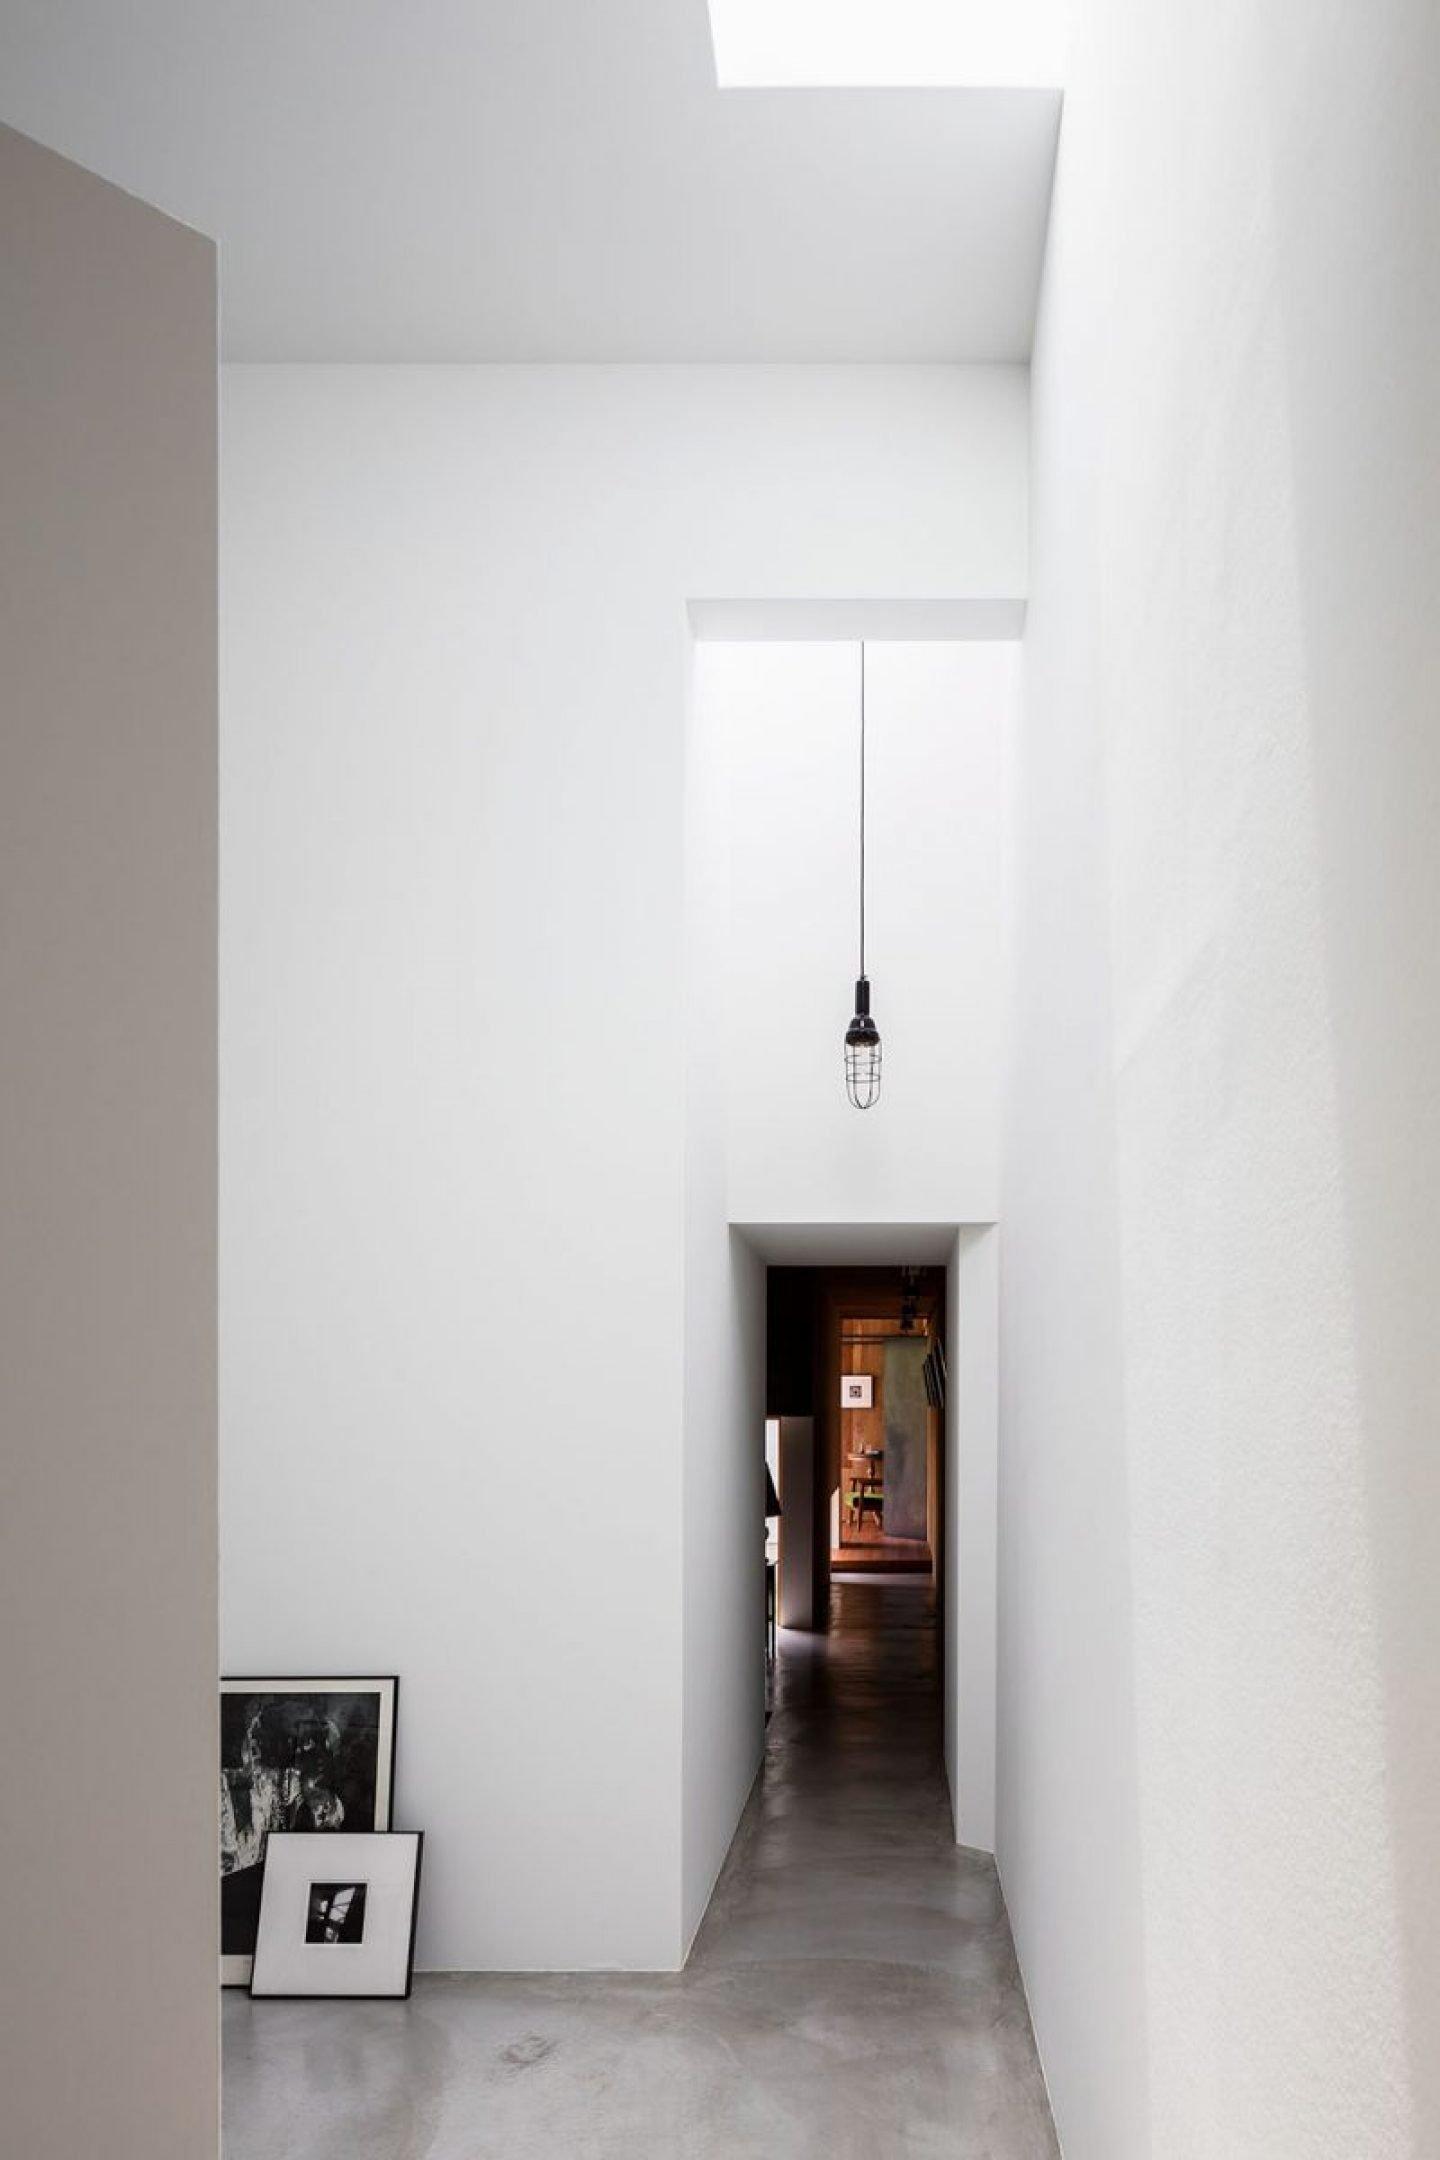 iGNANT_Architecture_House_For_A_Photographer_FORM_Kouichi_Kimura_Architects_15